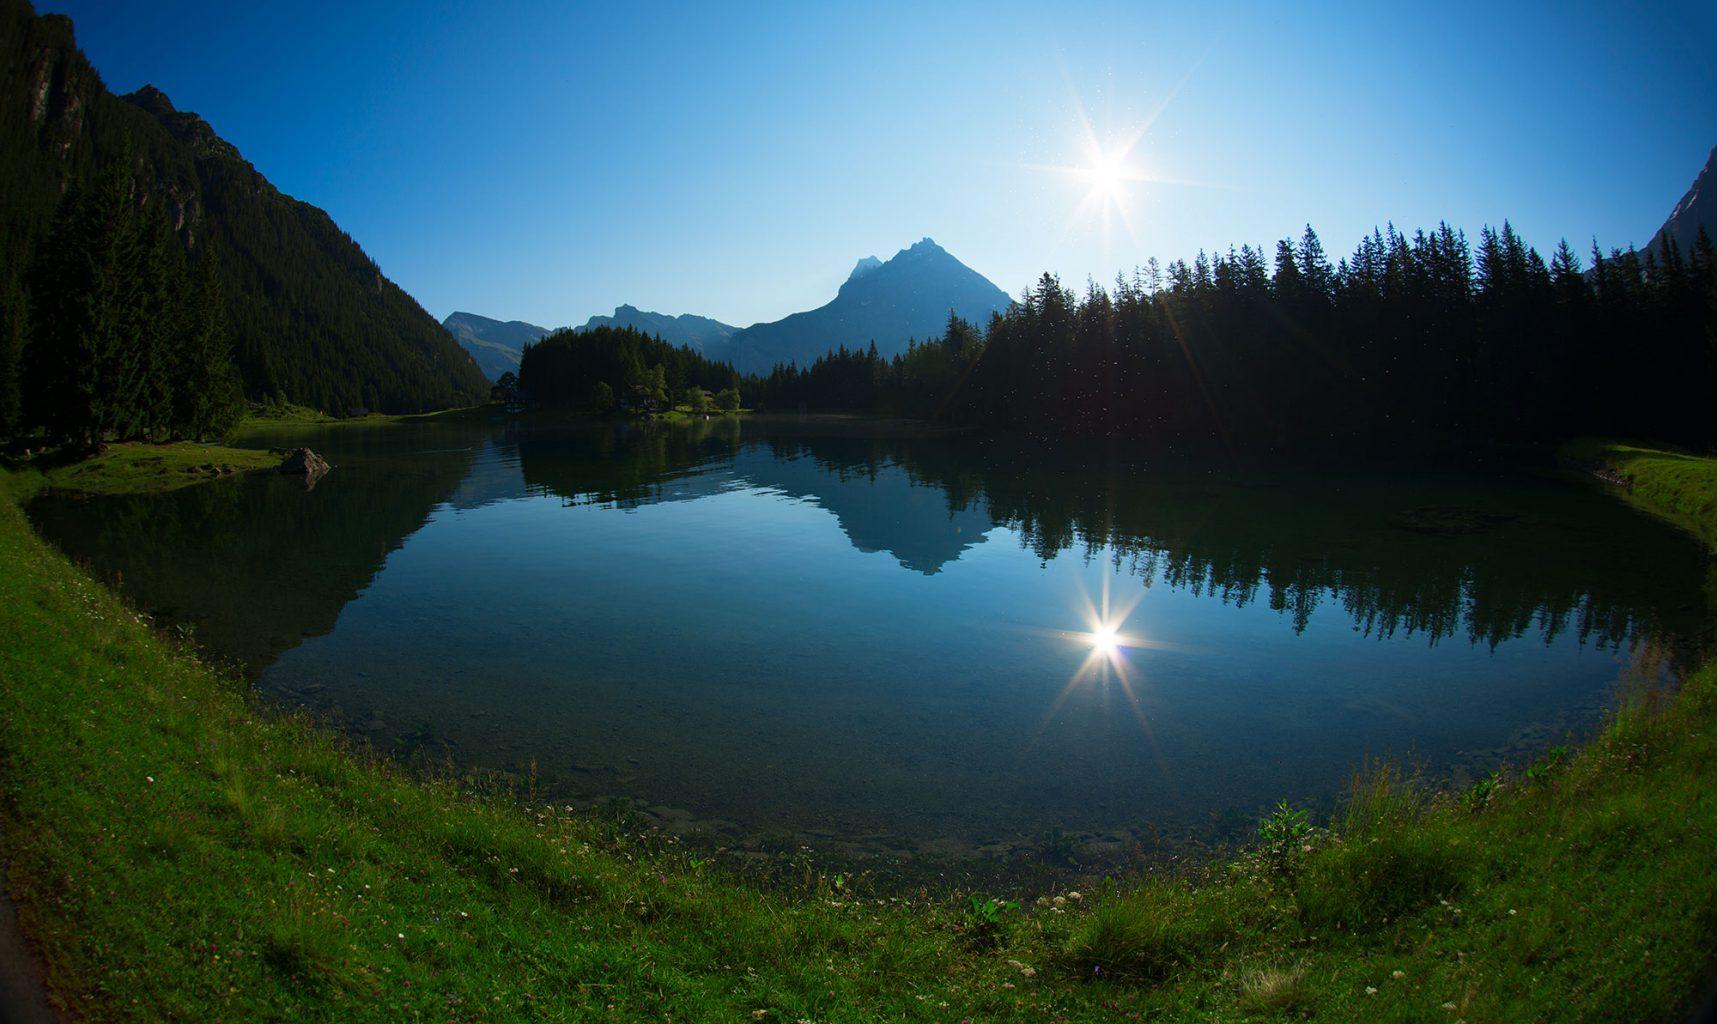 Sunniggrätli, Canton Uri - Switzerland